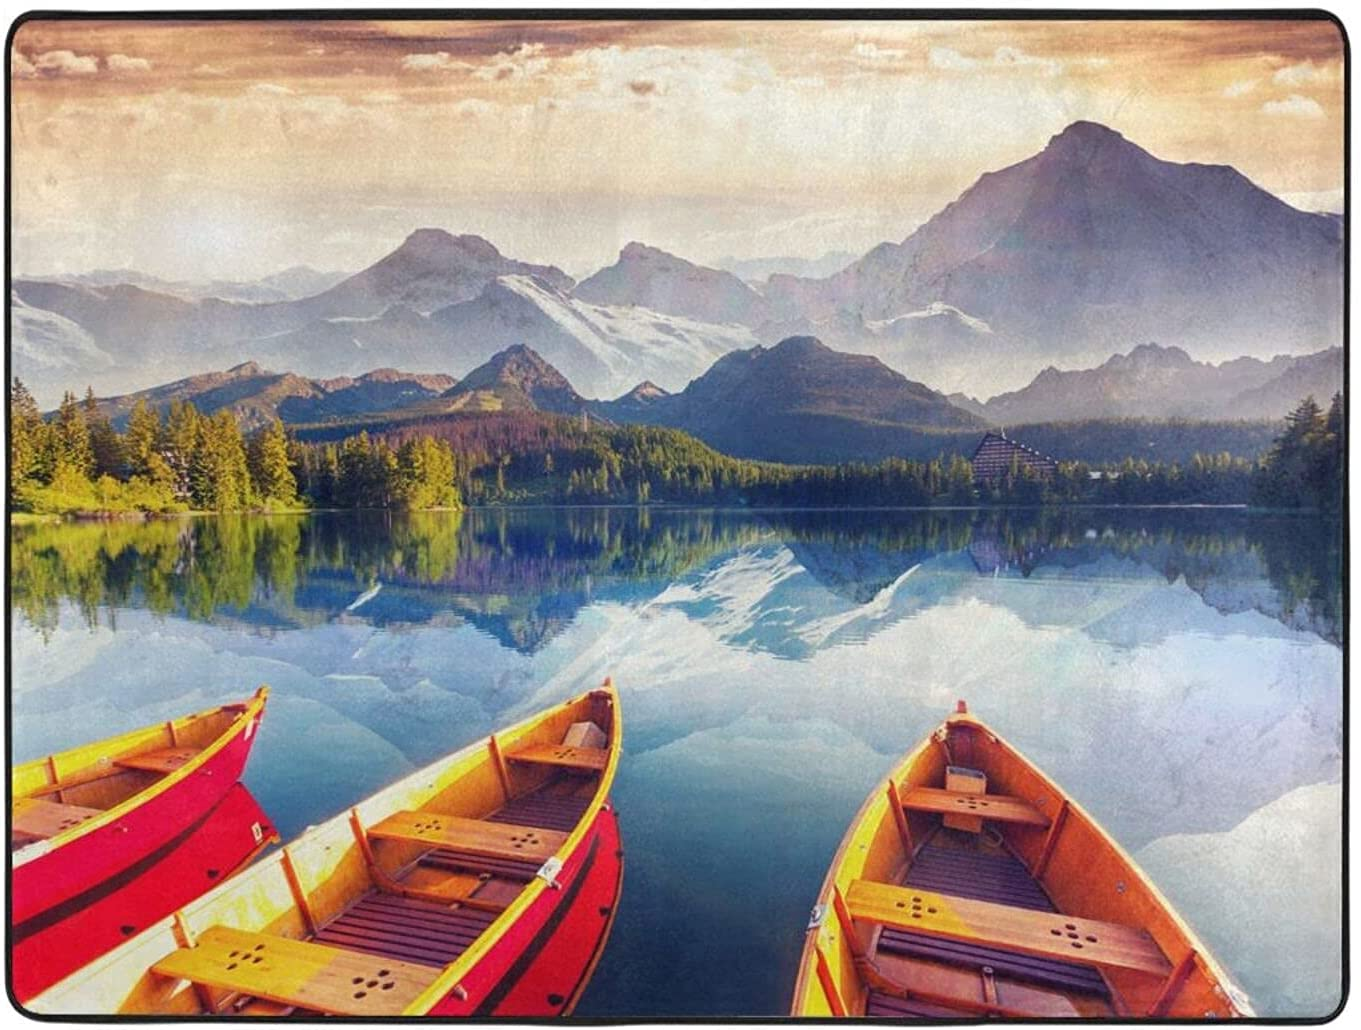 Lzhengsi Super Soft Max 48% OFF Modern Carpet Mountain Superior Boat Print Area Lake